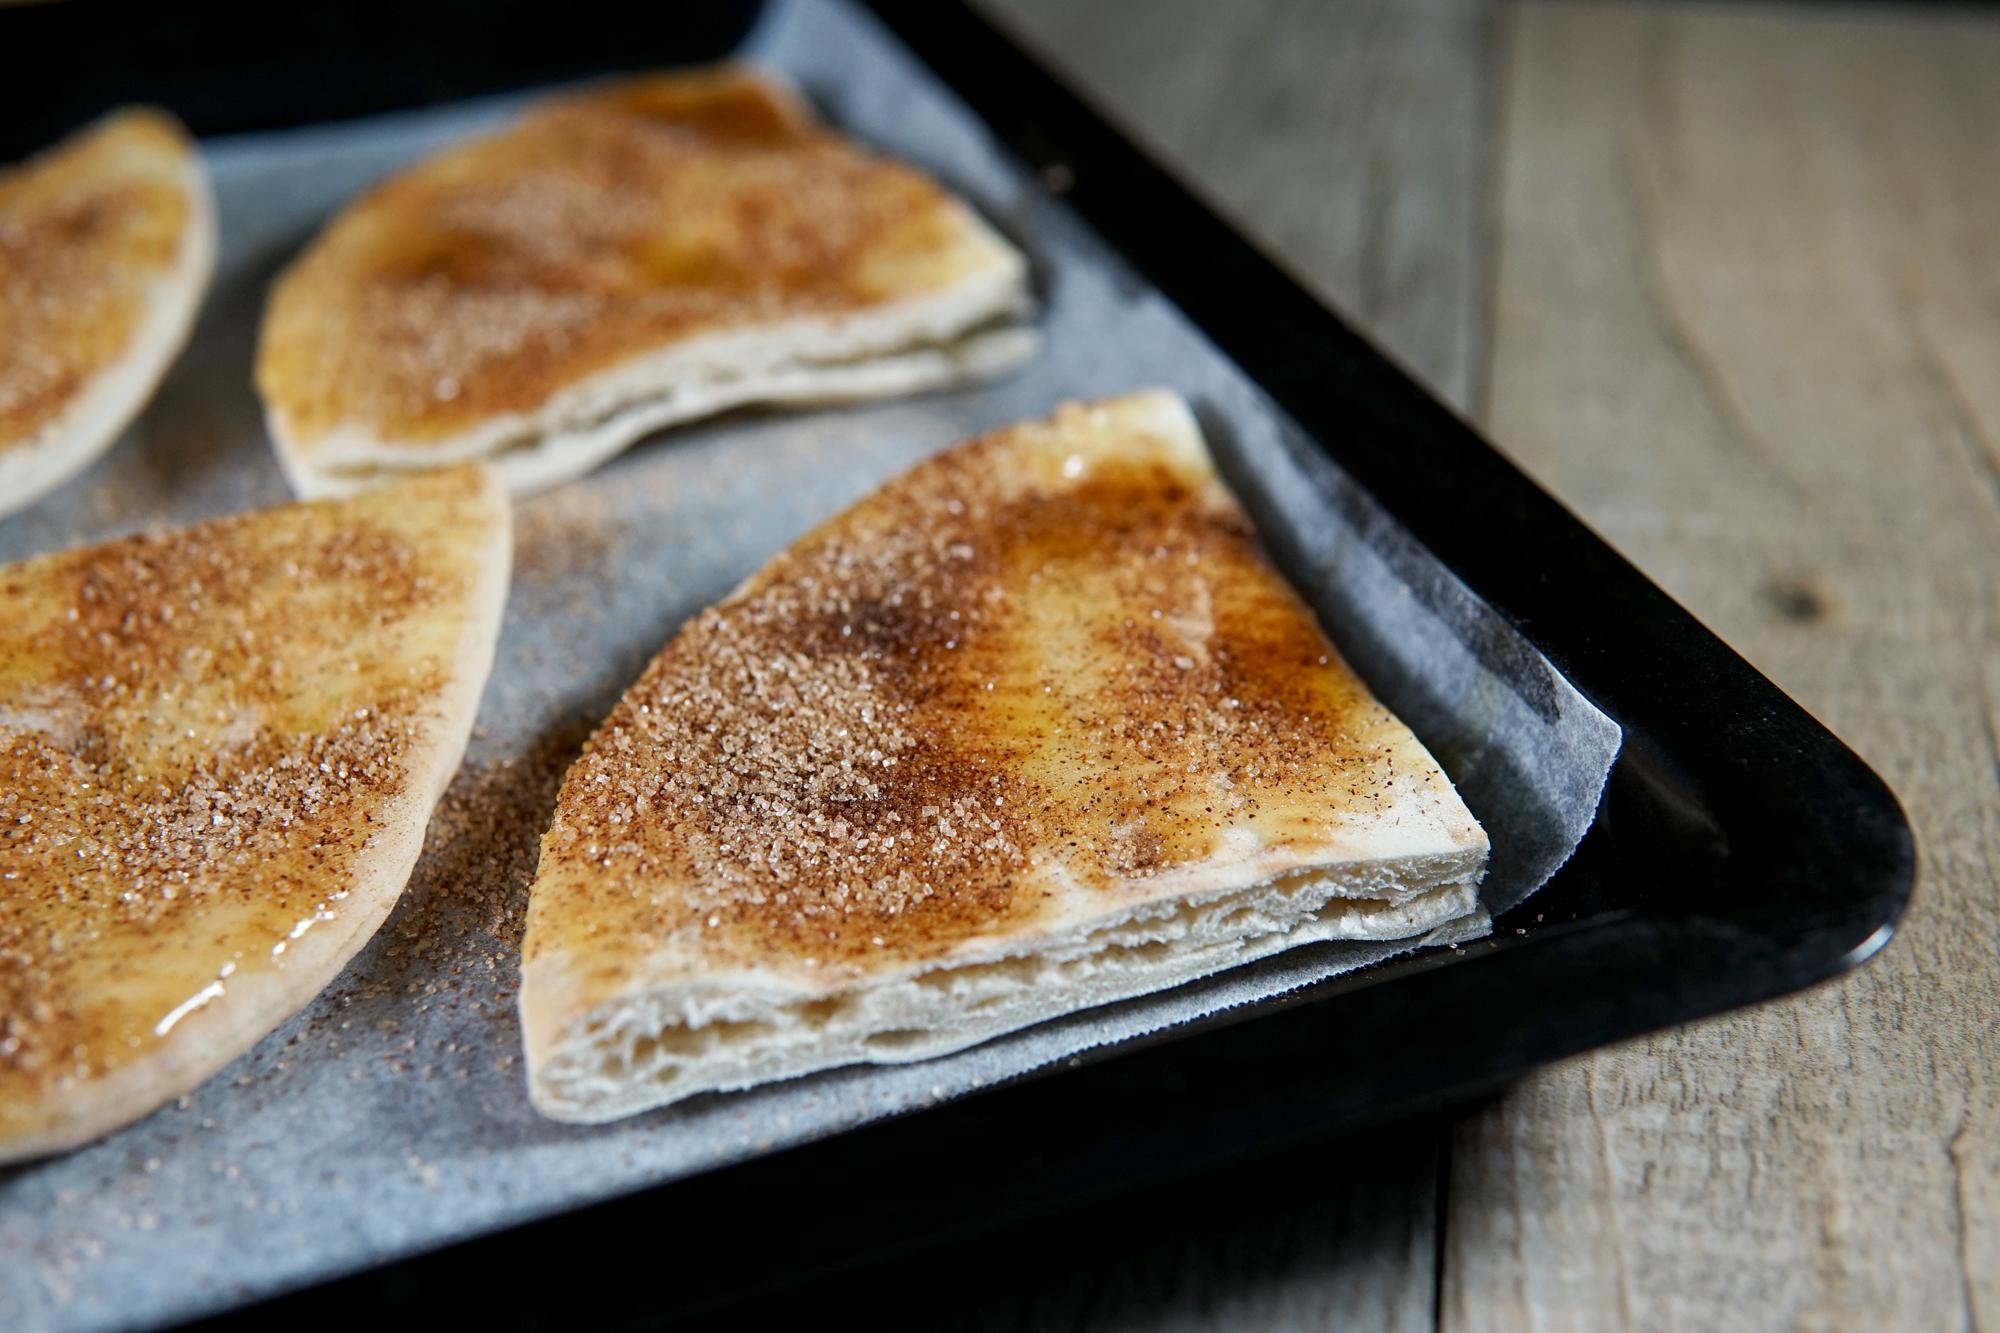 Cinnamon Sugar Pita Chips Recipe by Broke and Cooking - www.brokeandcooking.com